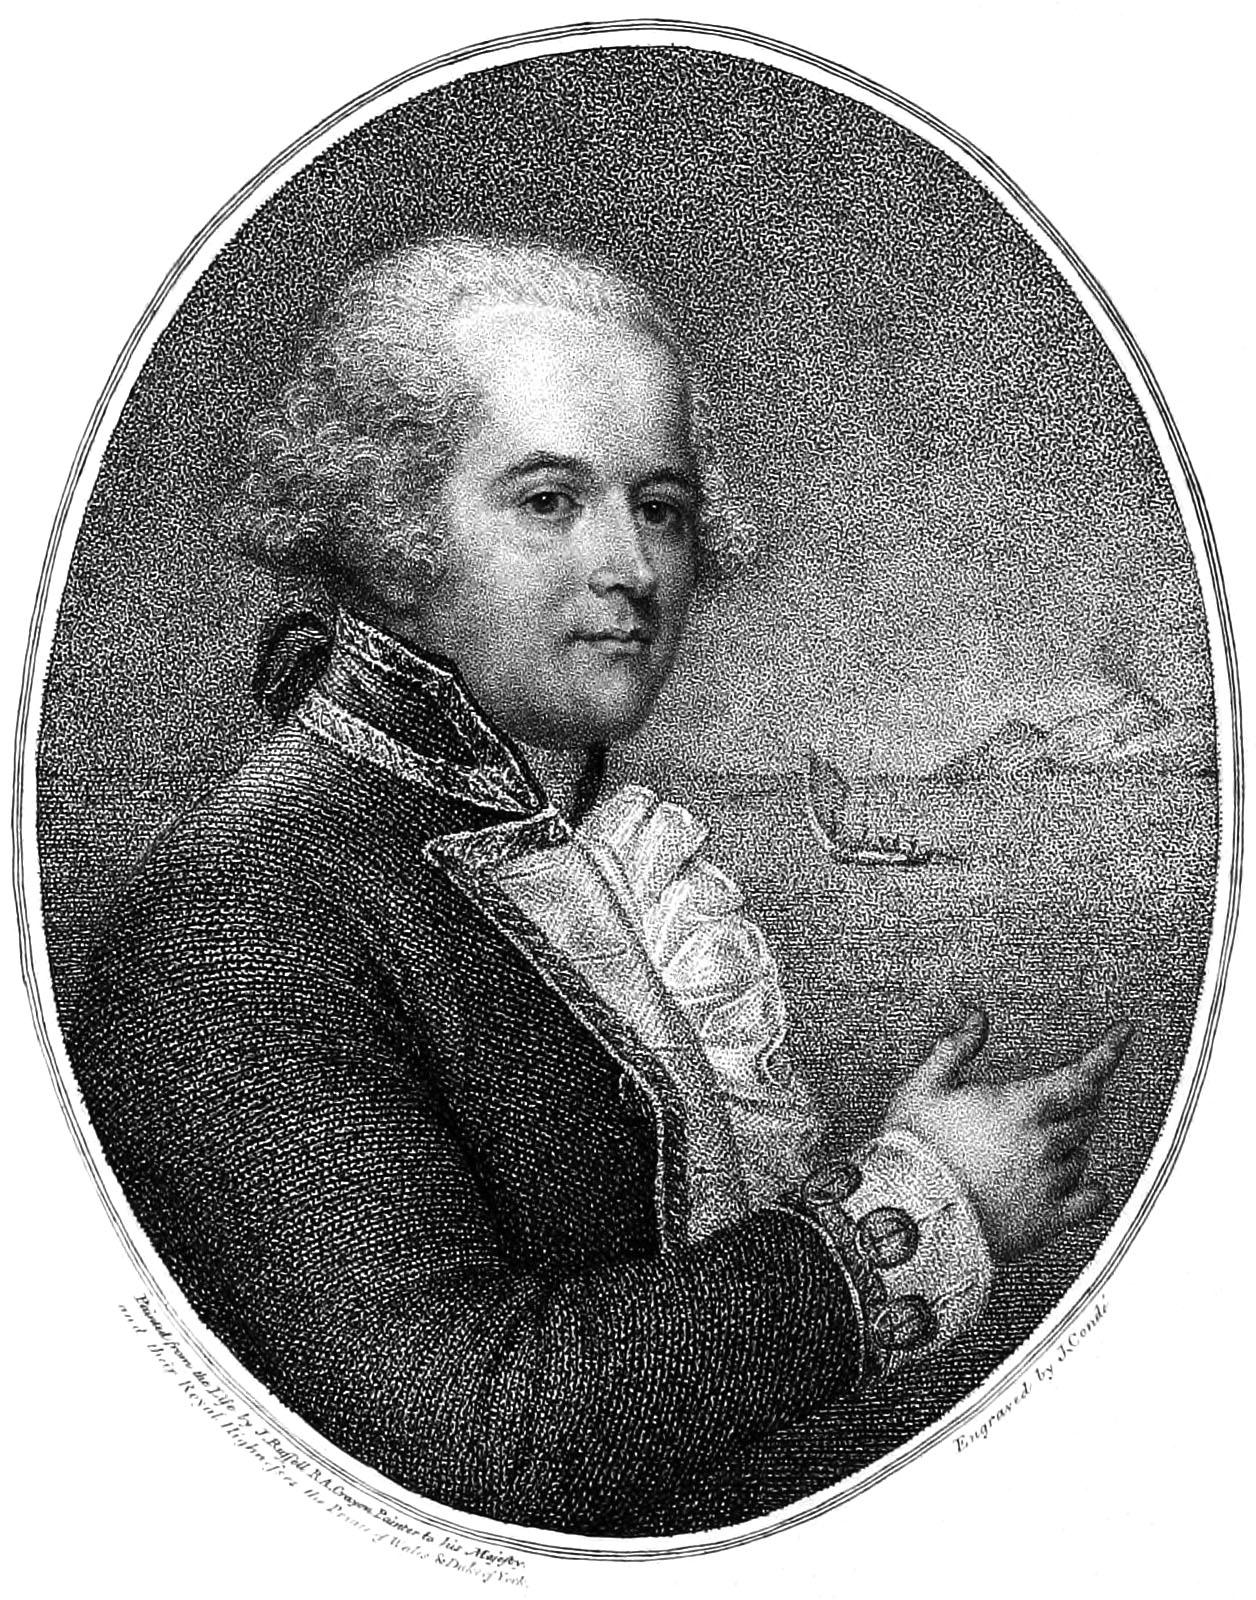 File William Bligh Project Gutenberg Etext 15411 Jpg